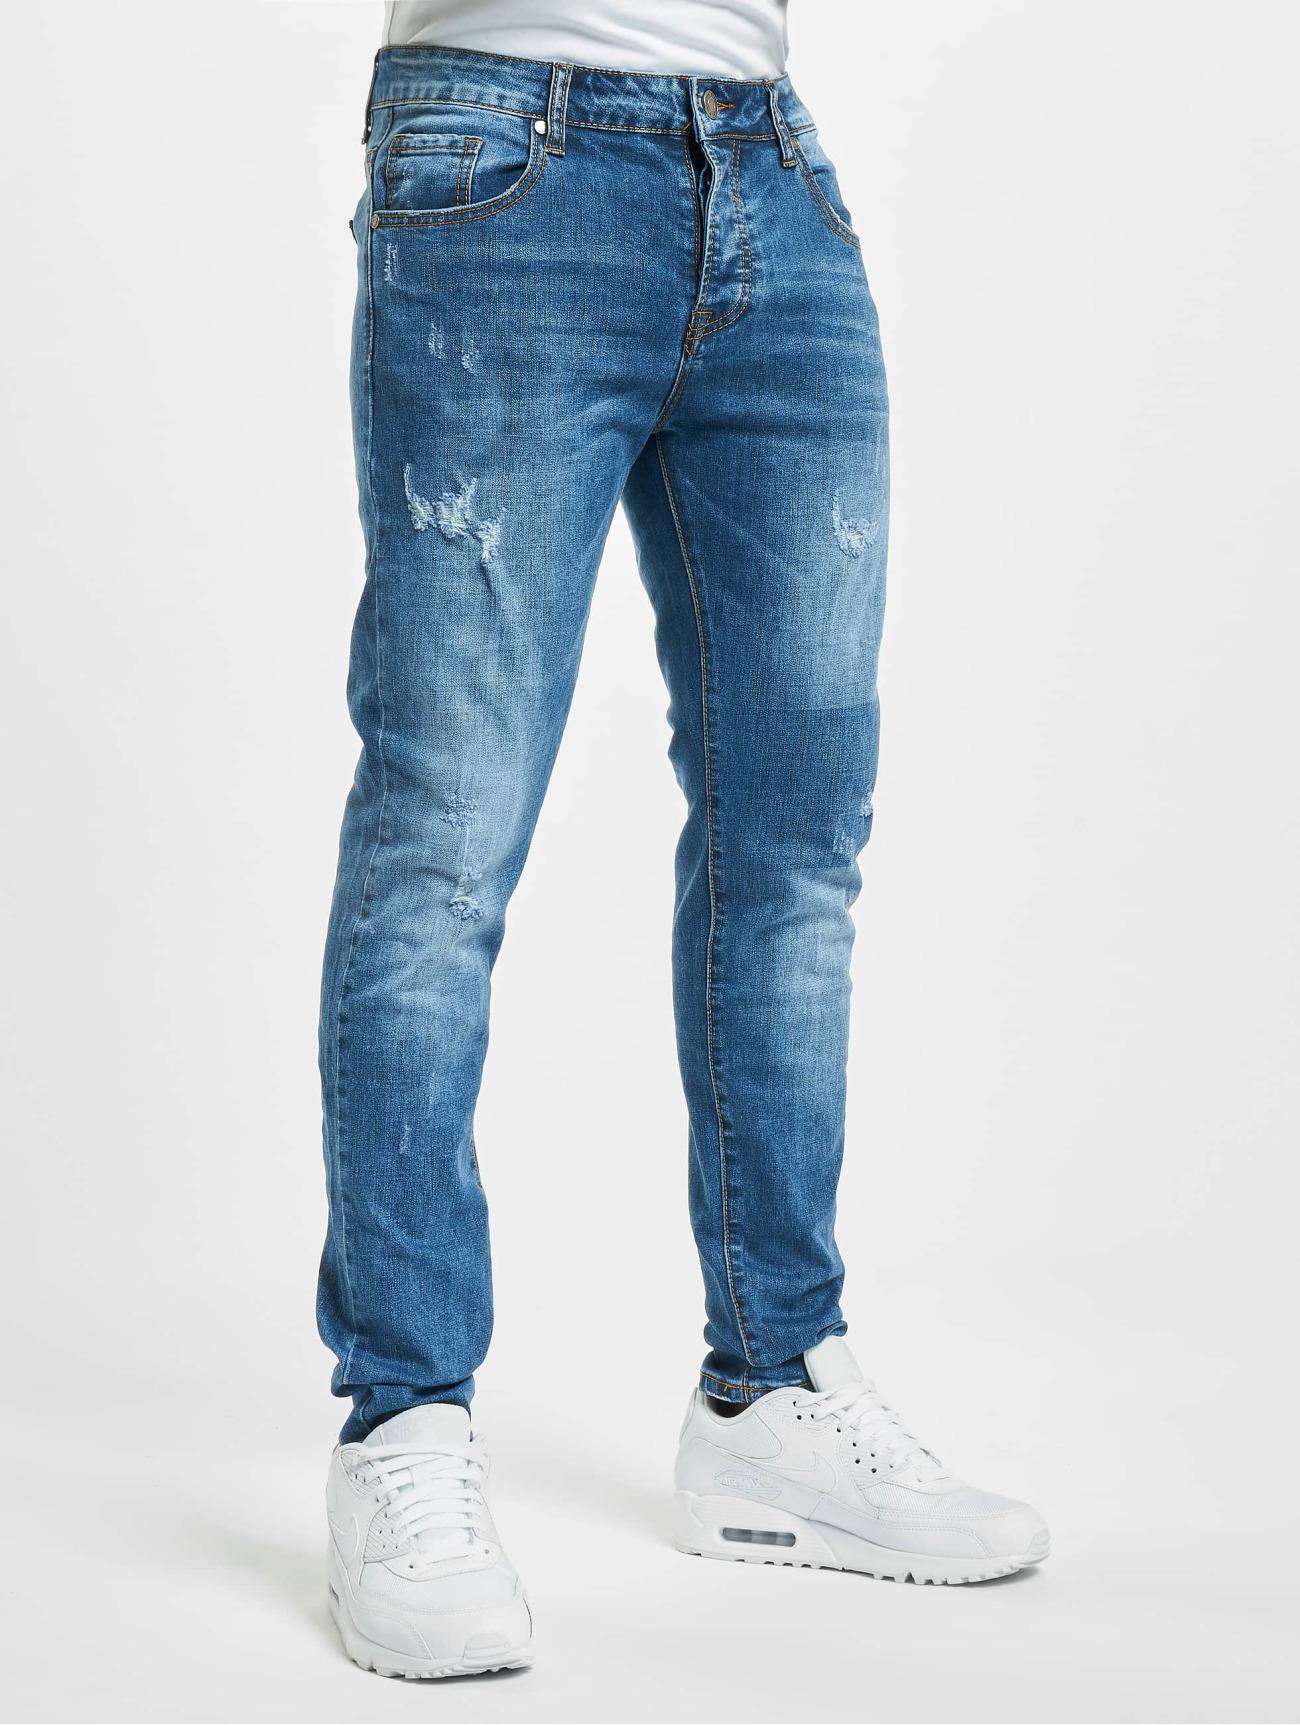 Aarhon  Cutz  bleu Homme Jean skinny  773686 Homme Jeans